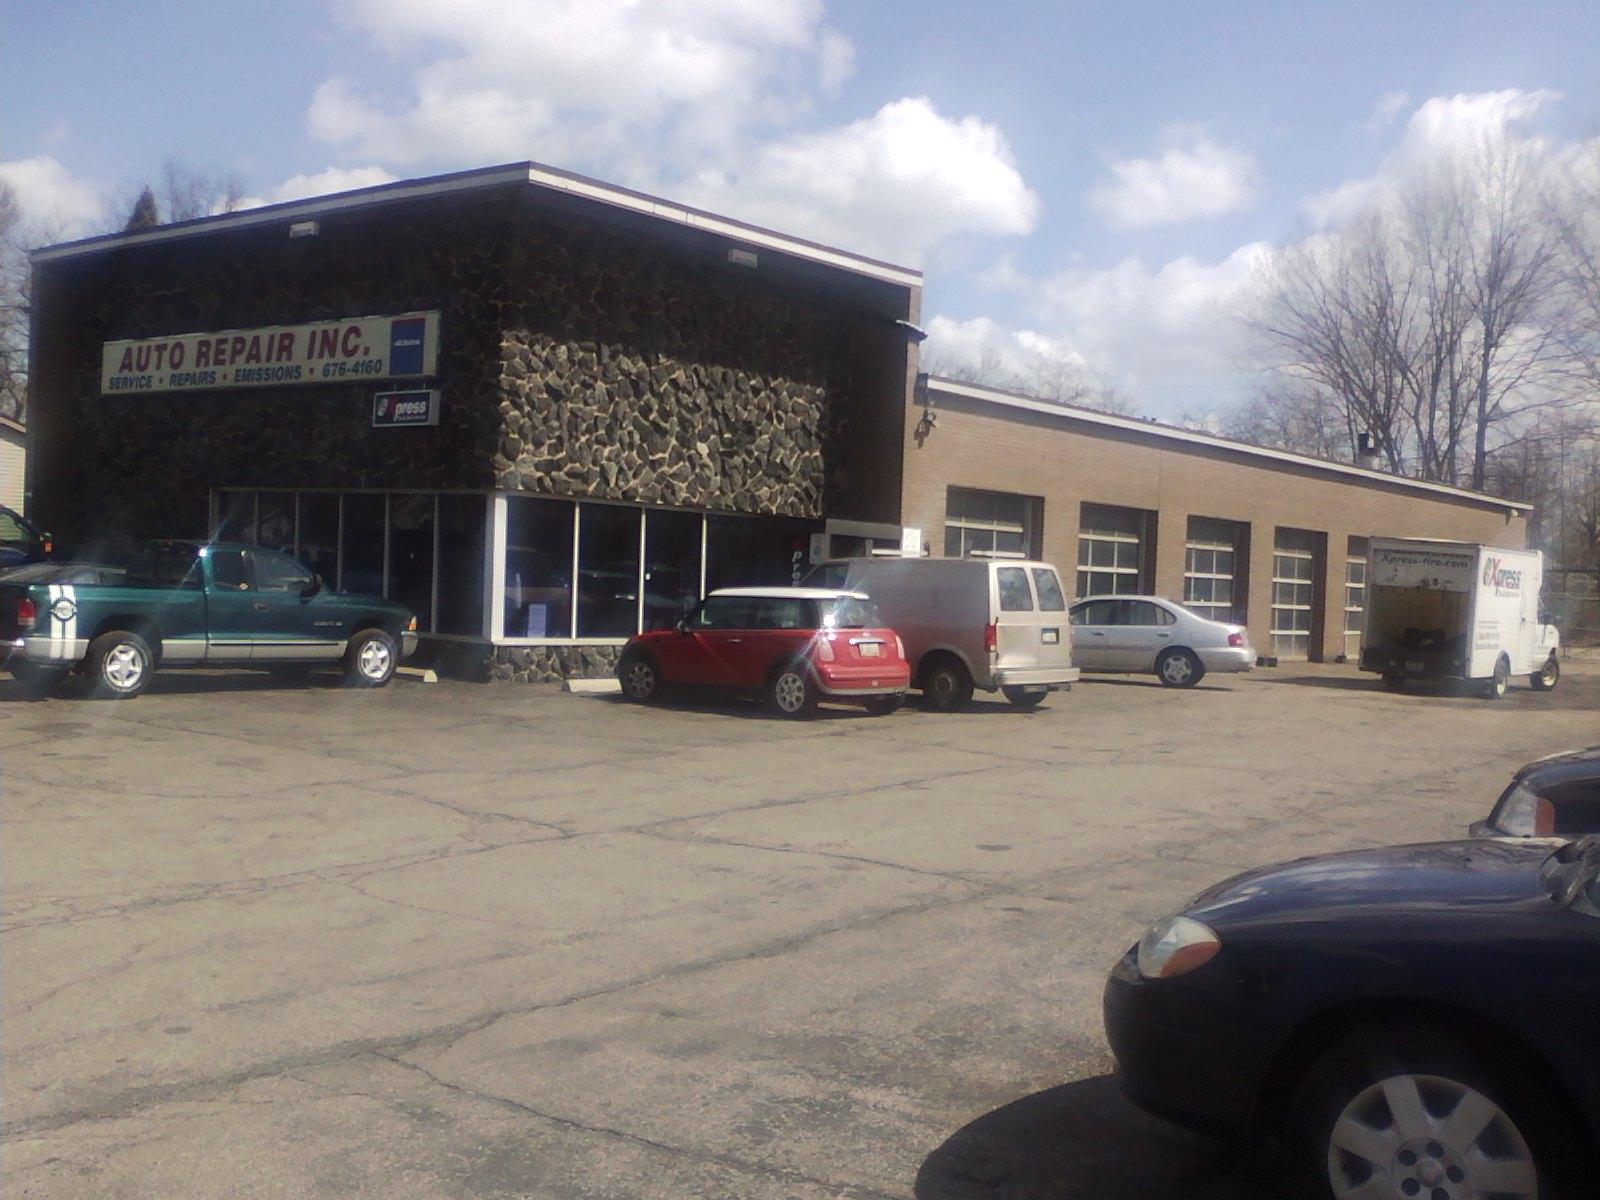 Martys Automotive dba. Auto Repair Inc.